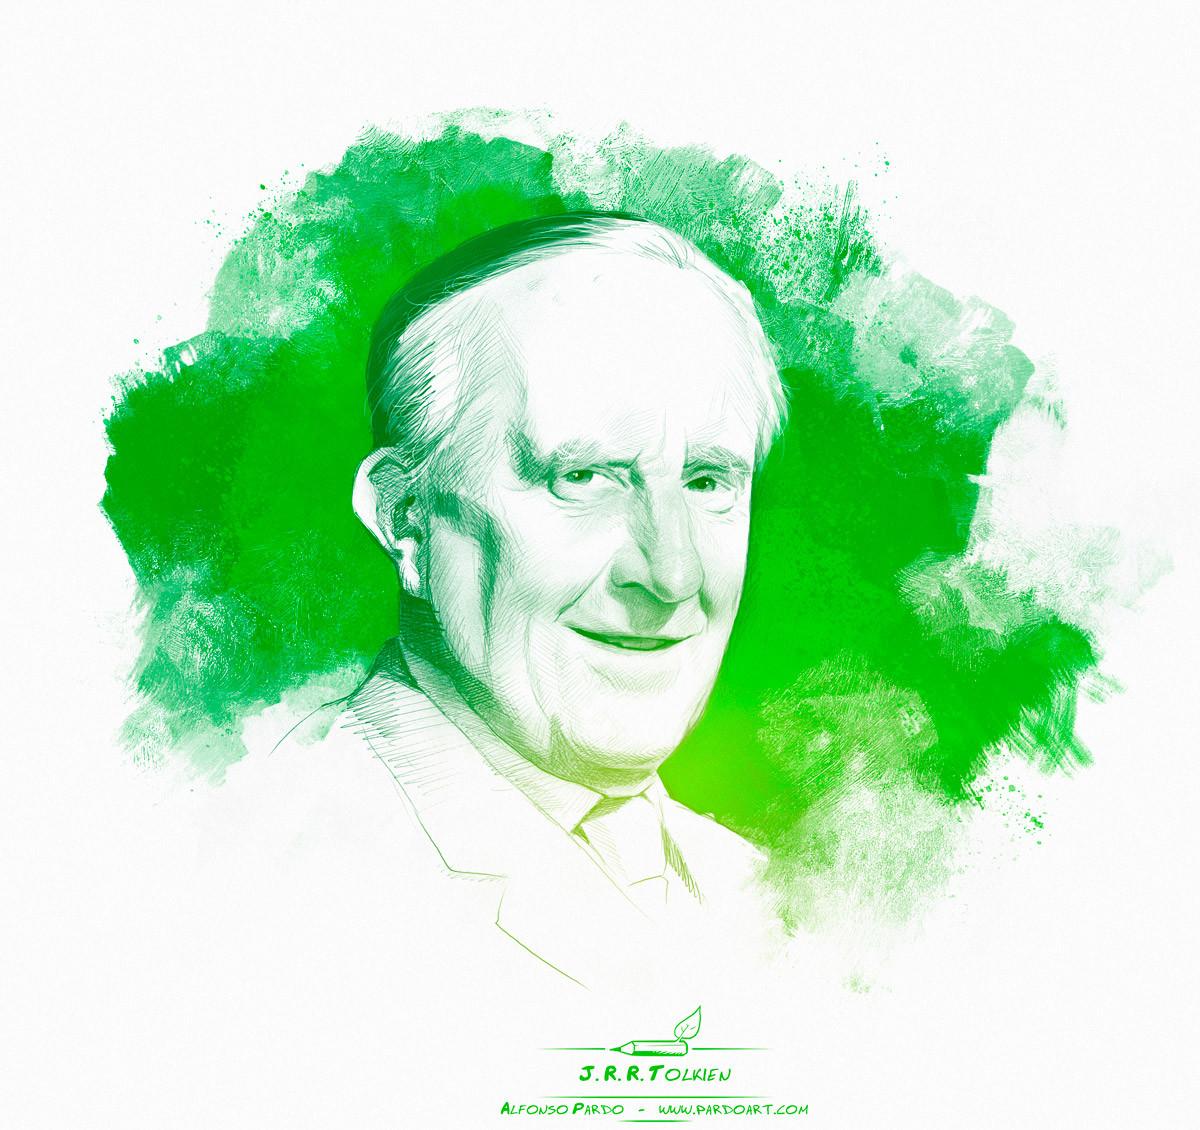 Gods -  J. R. R. Tolkien